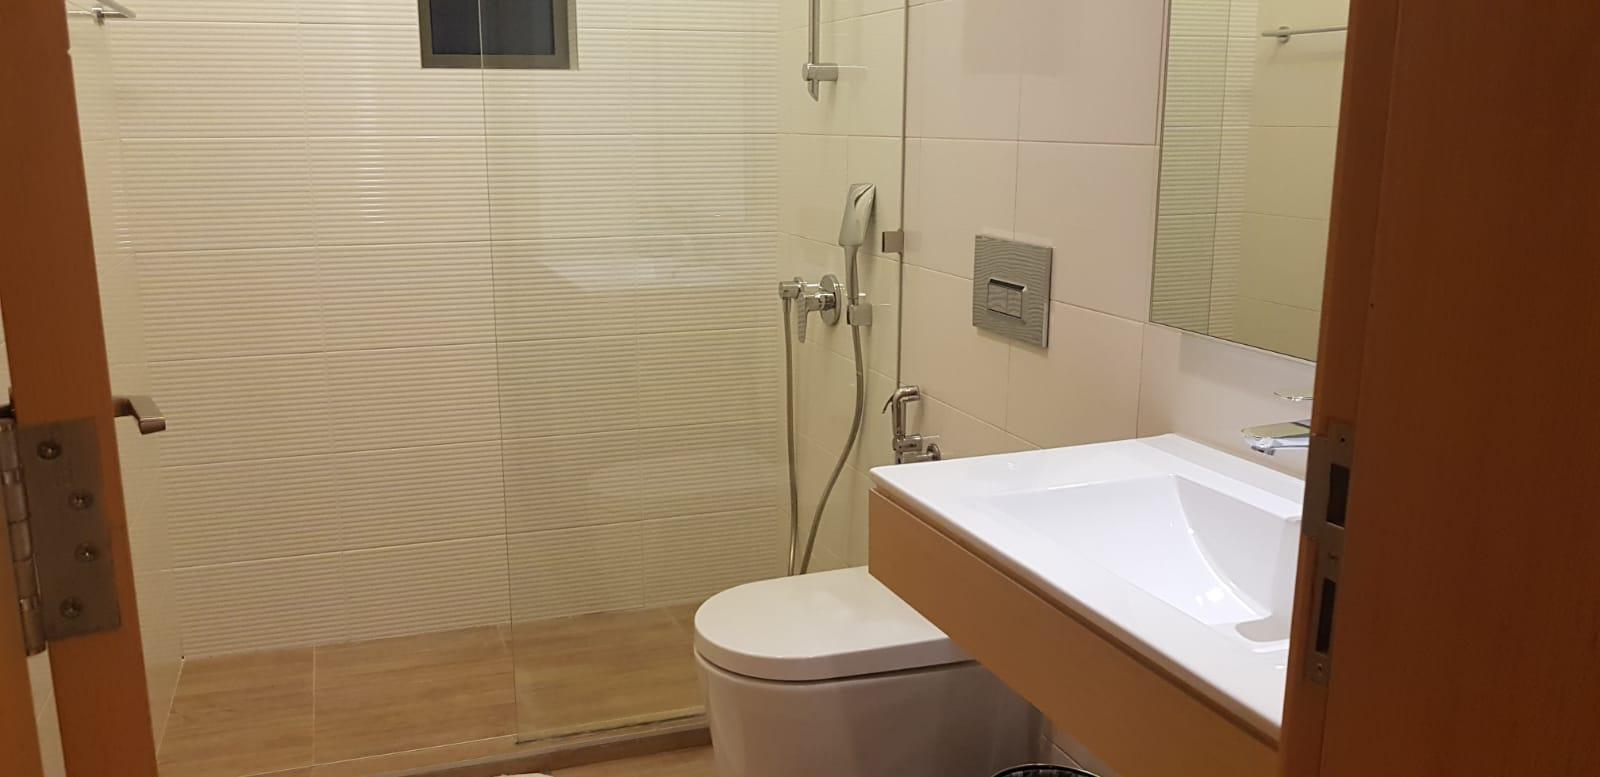 Modern & Luxurious 2 Bedroom Apartment in Juffair!